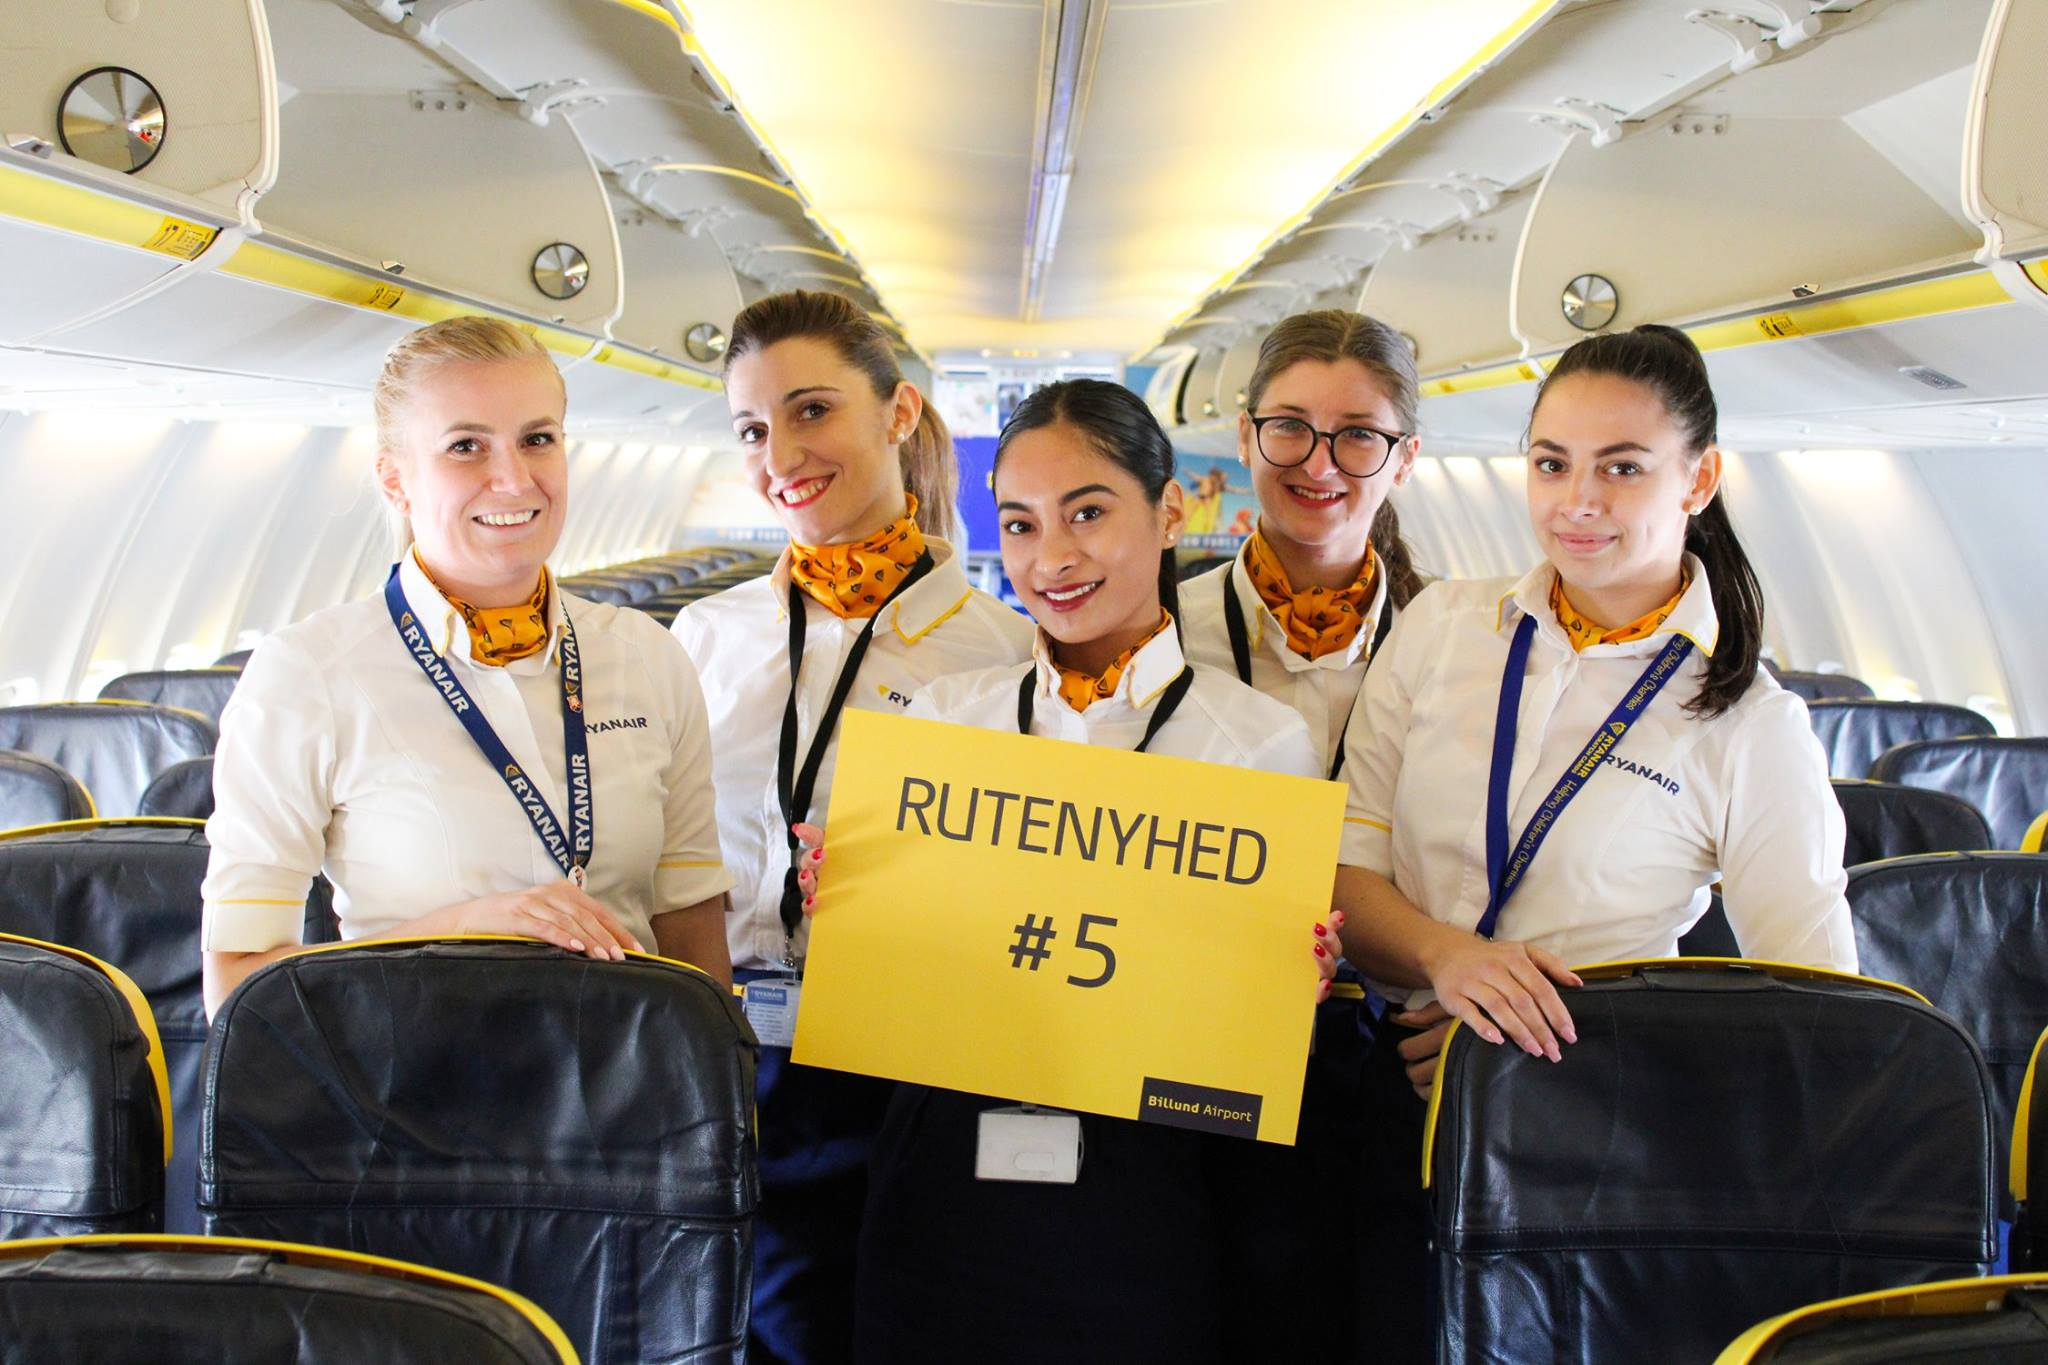 Ryanair-ruten til Prag er årets femte rutenyhed fra Billund Lufthavn. (Foto: Billund Lufthavn/PR)